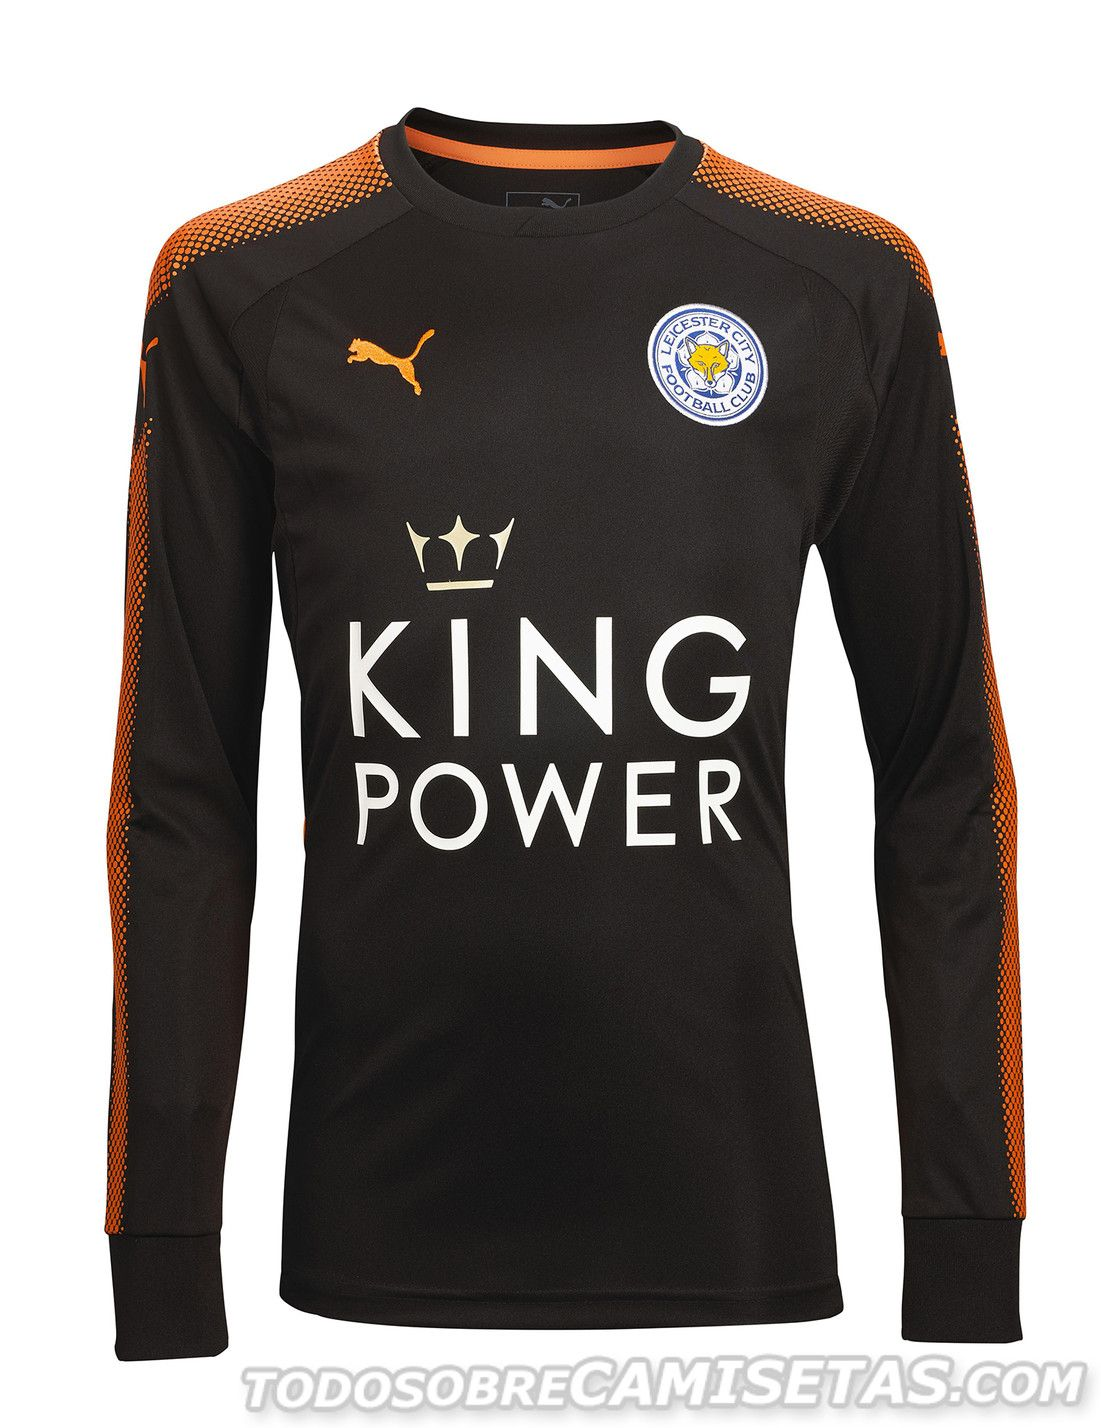 68afad053 Leicester City FC Puma 2017-18 Home Kit